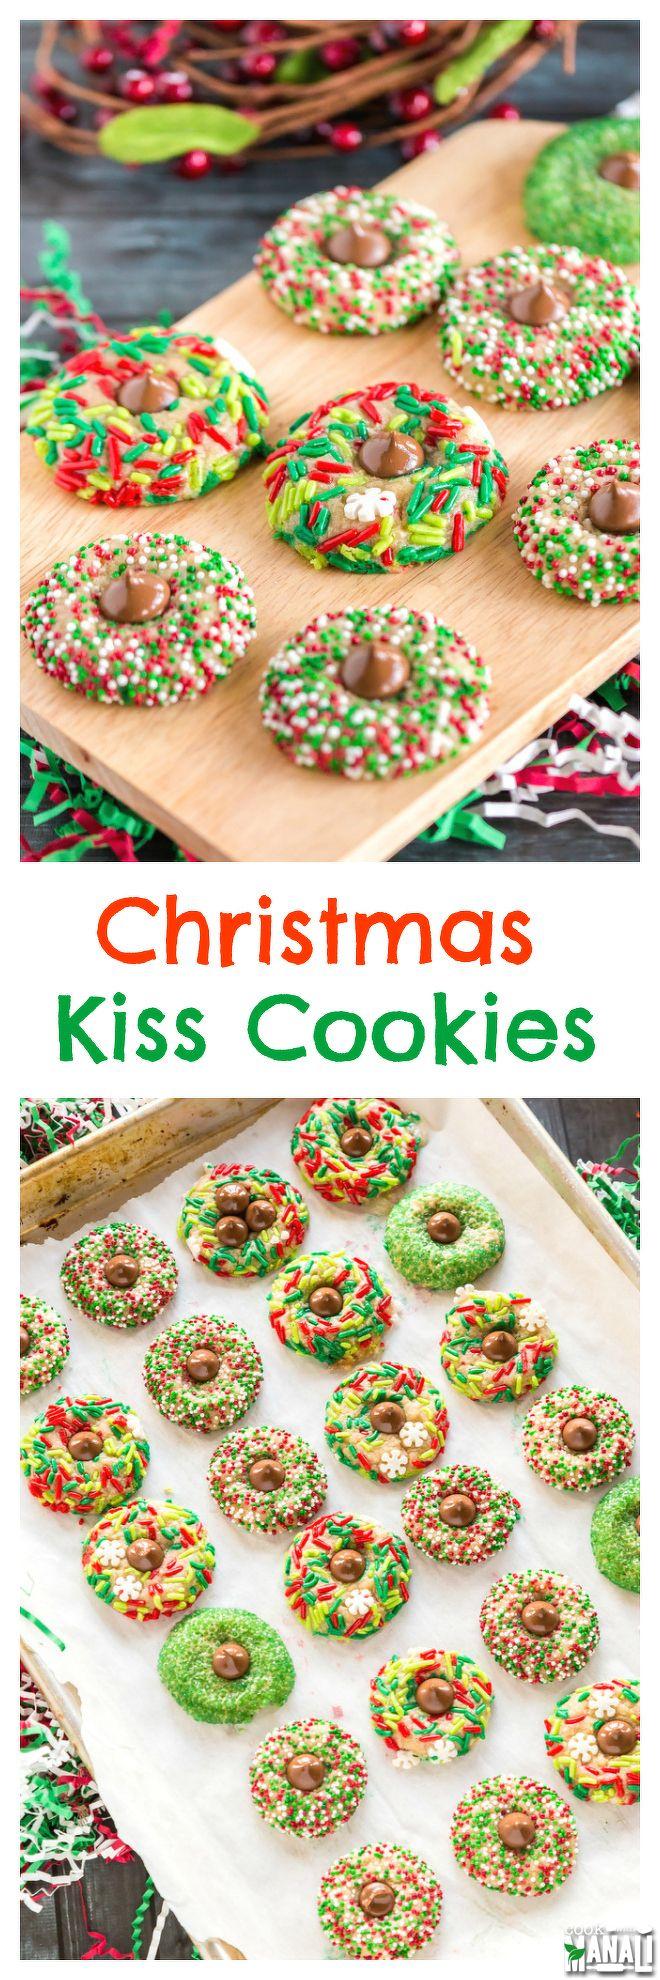 Christmas Kiss Cookies Cookies Kiss Cookies Christmas Kiss